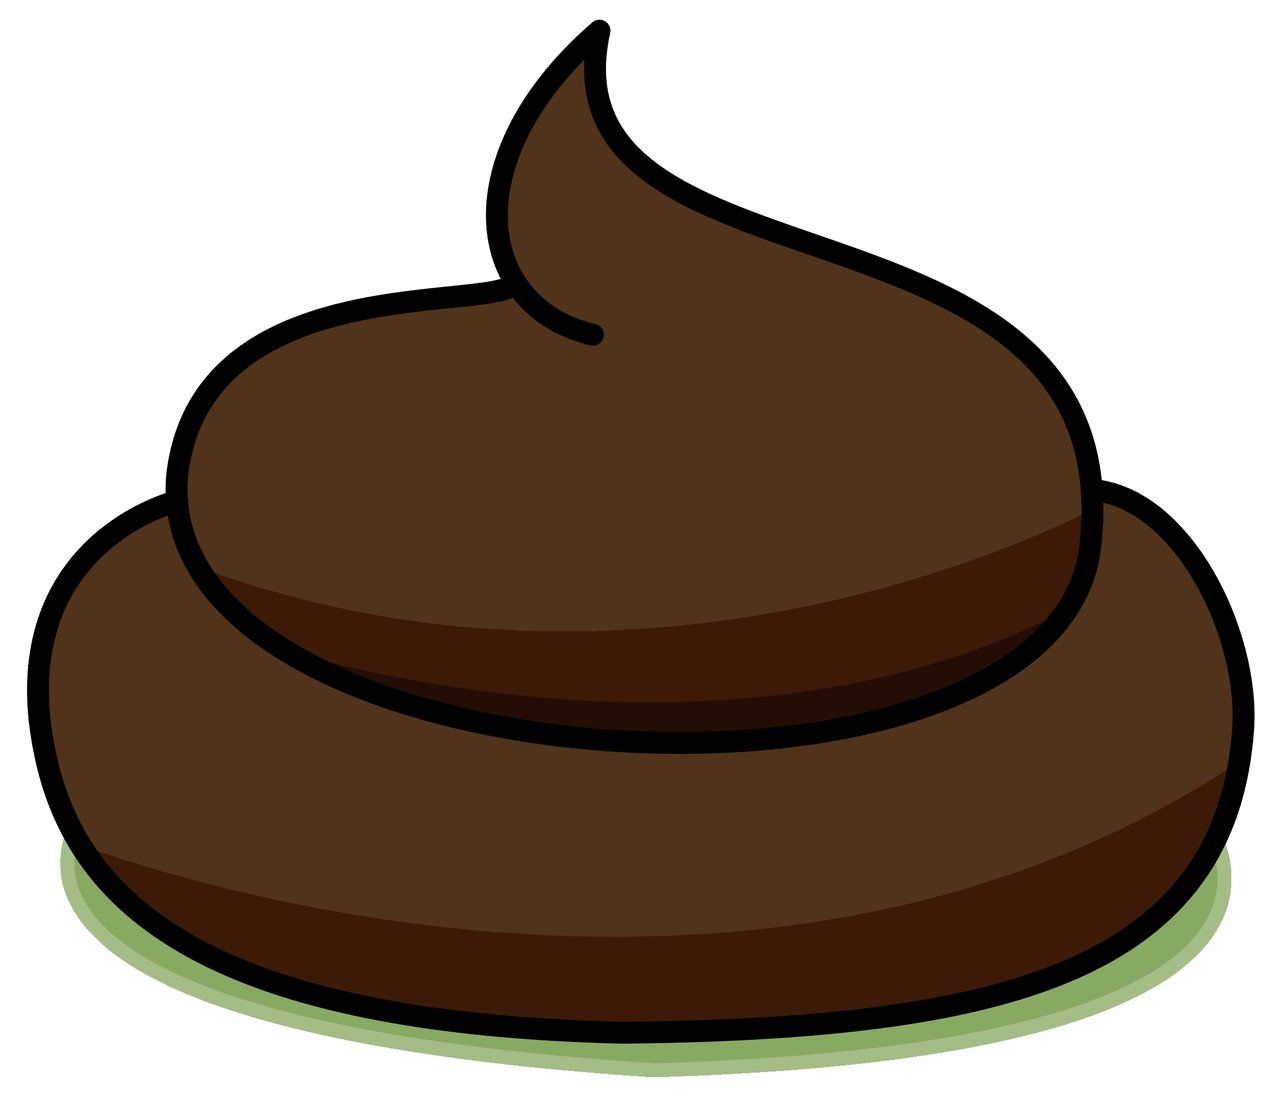 Poop cartoon poo clipart